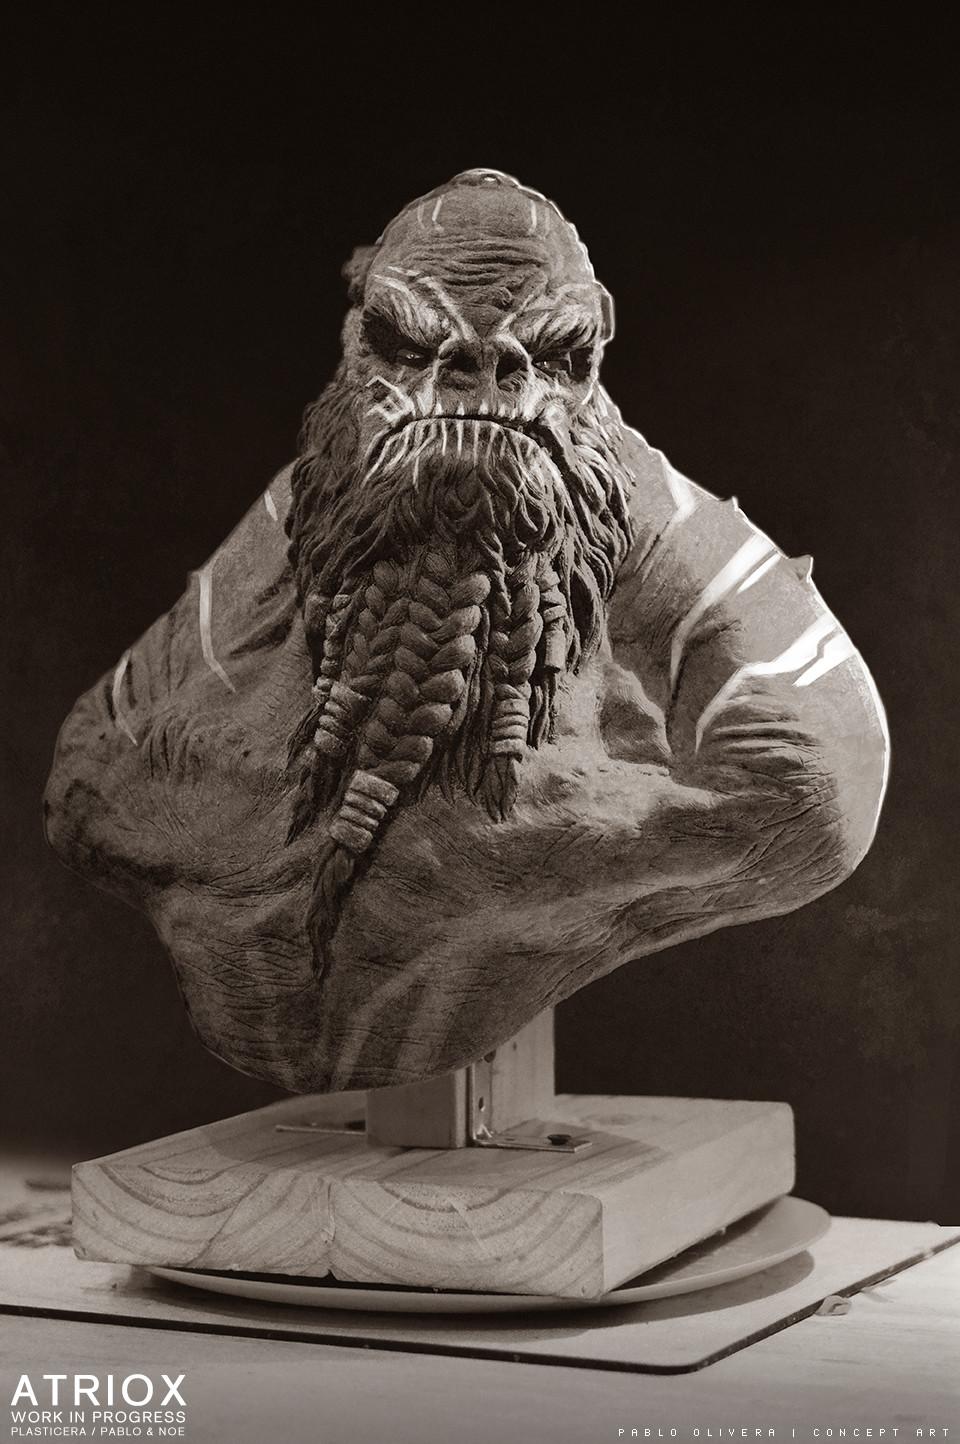 Pablo olivera atriox sculpture plasticera by pablo olivera 05